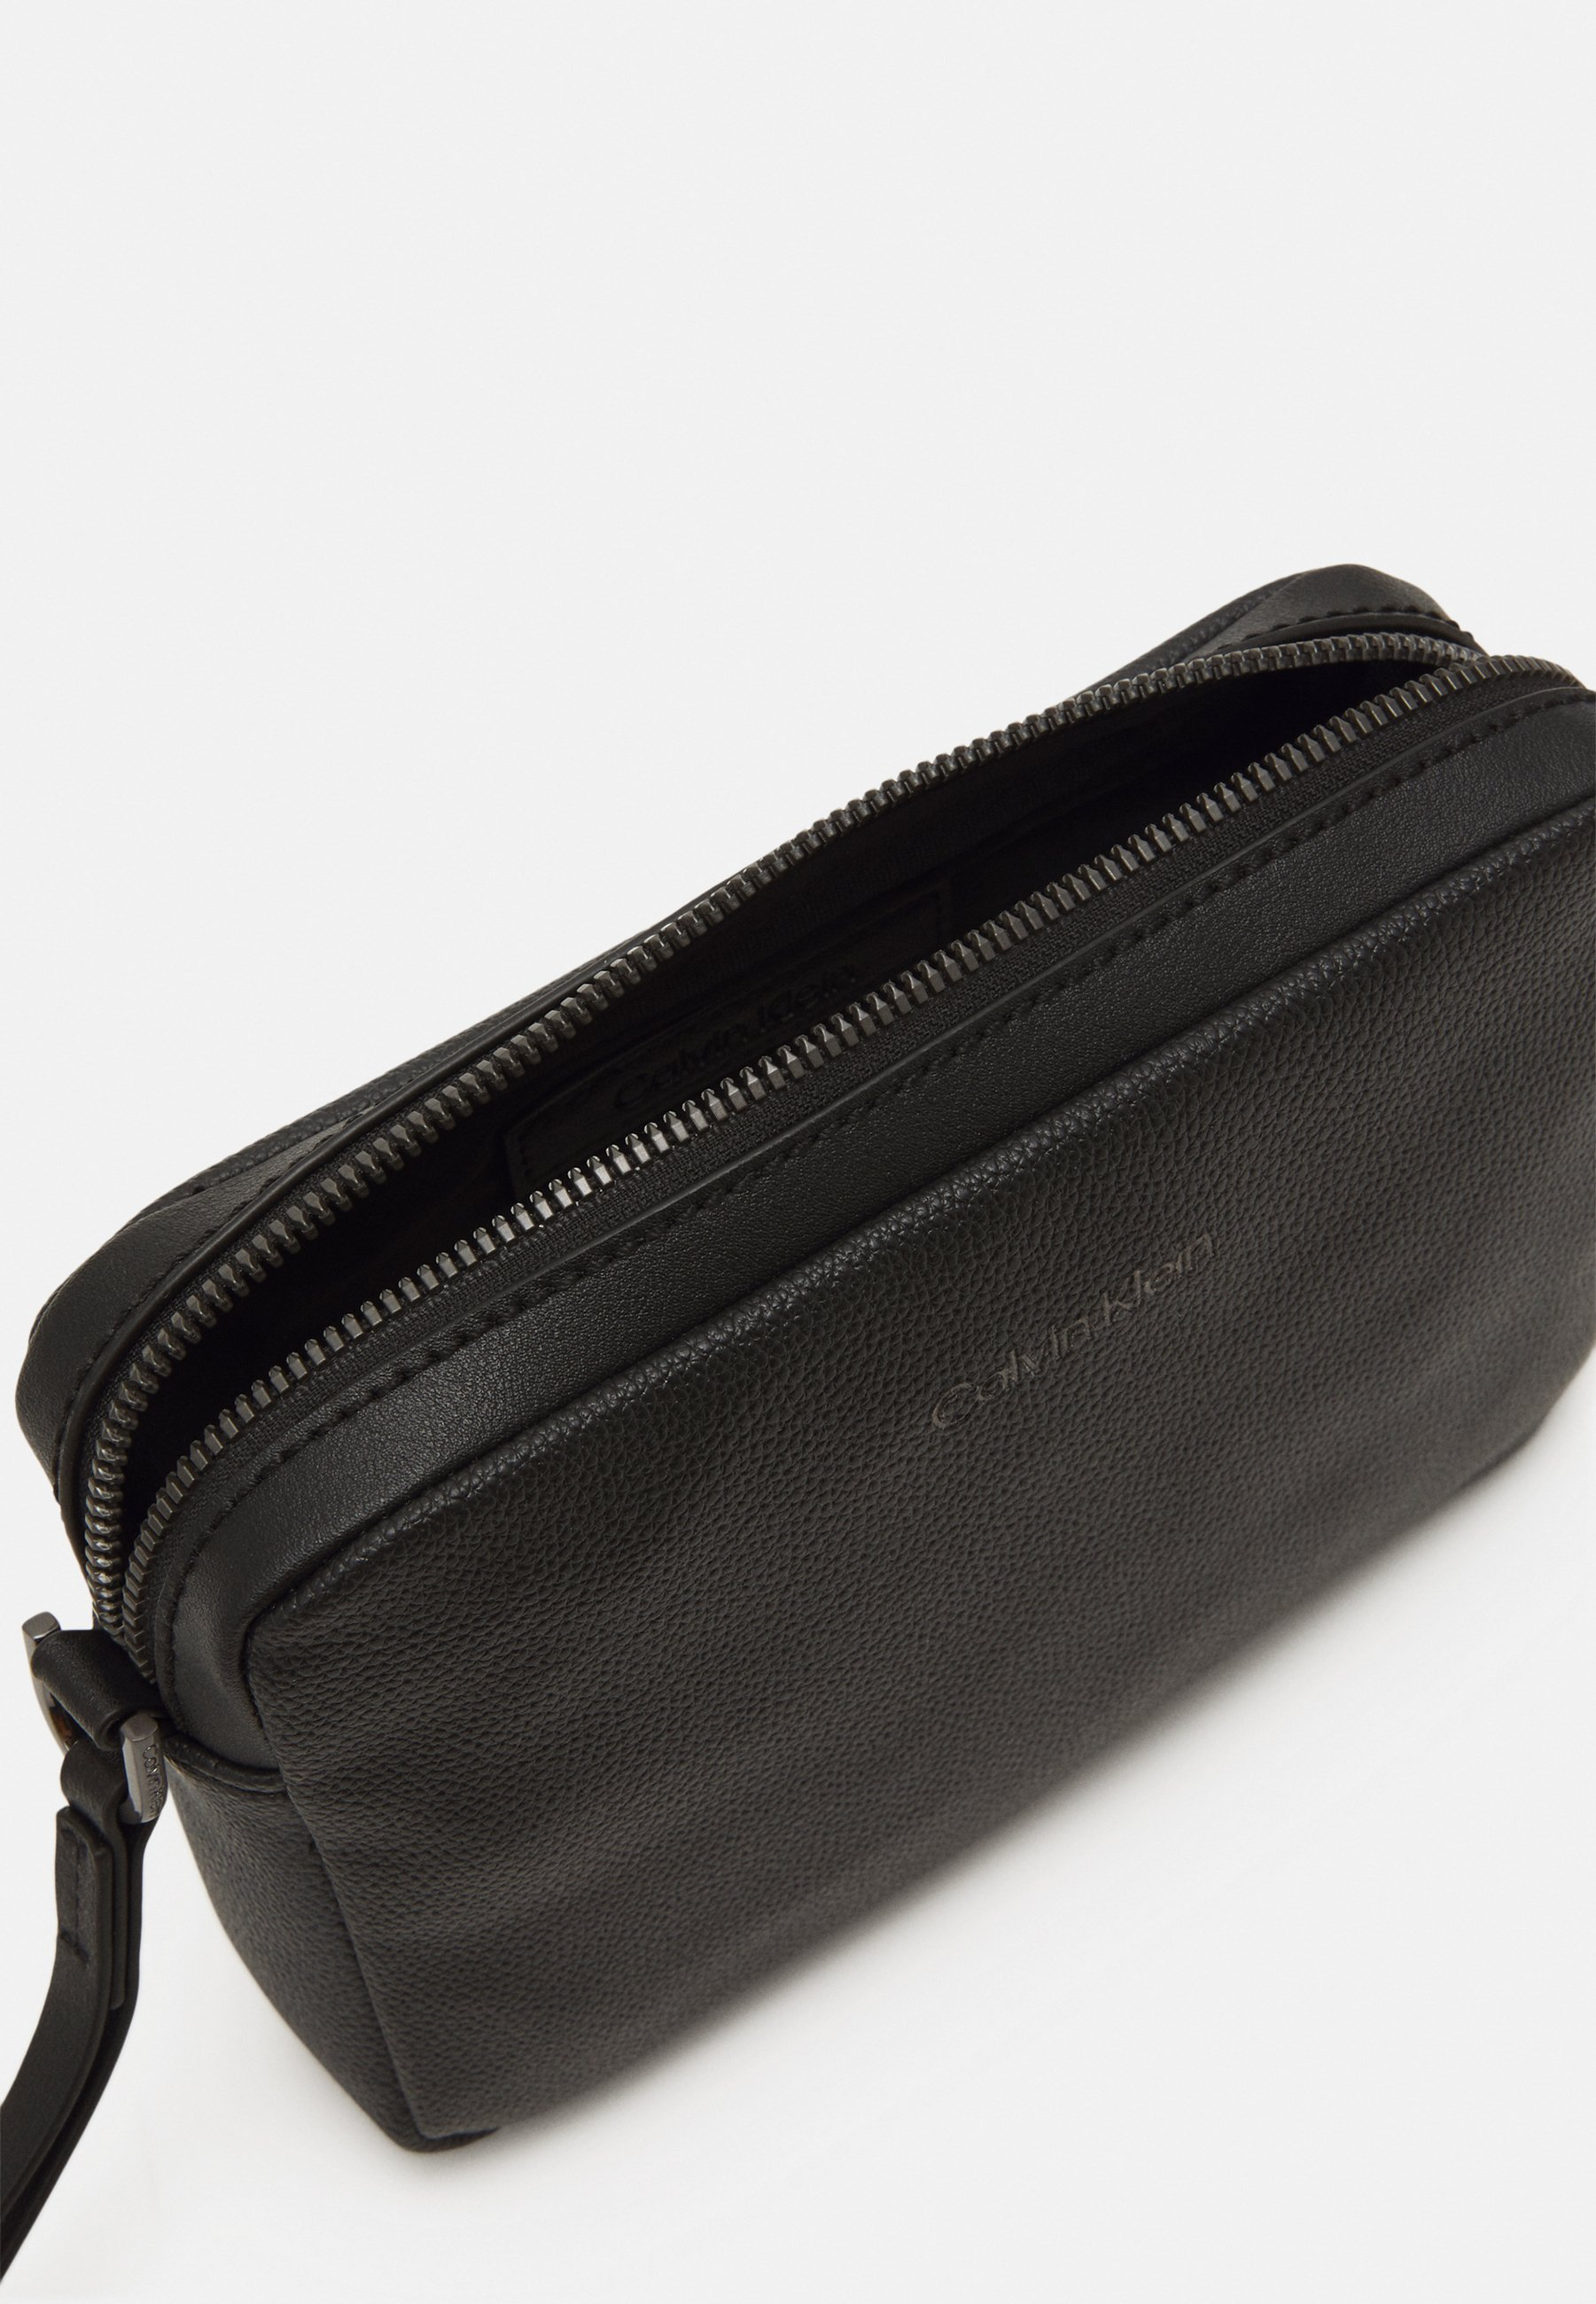 Herren WARMTH COMPACT CASE UNISEX - Handtasche